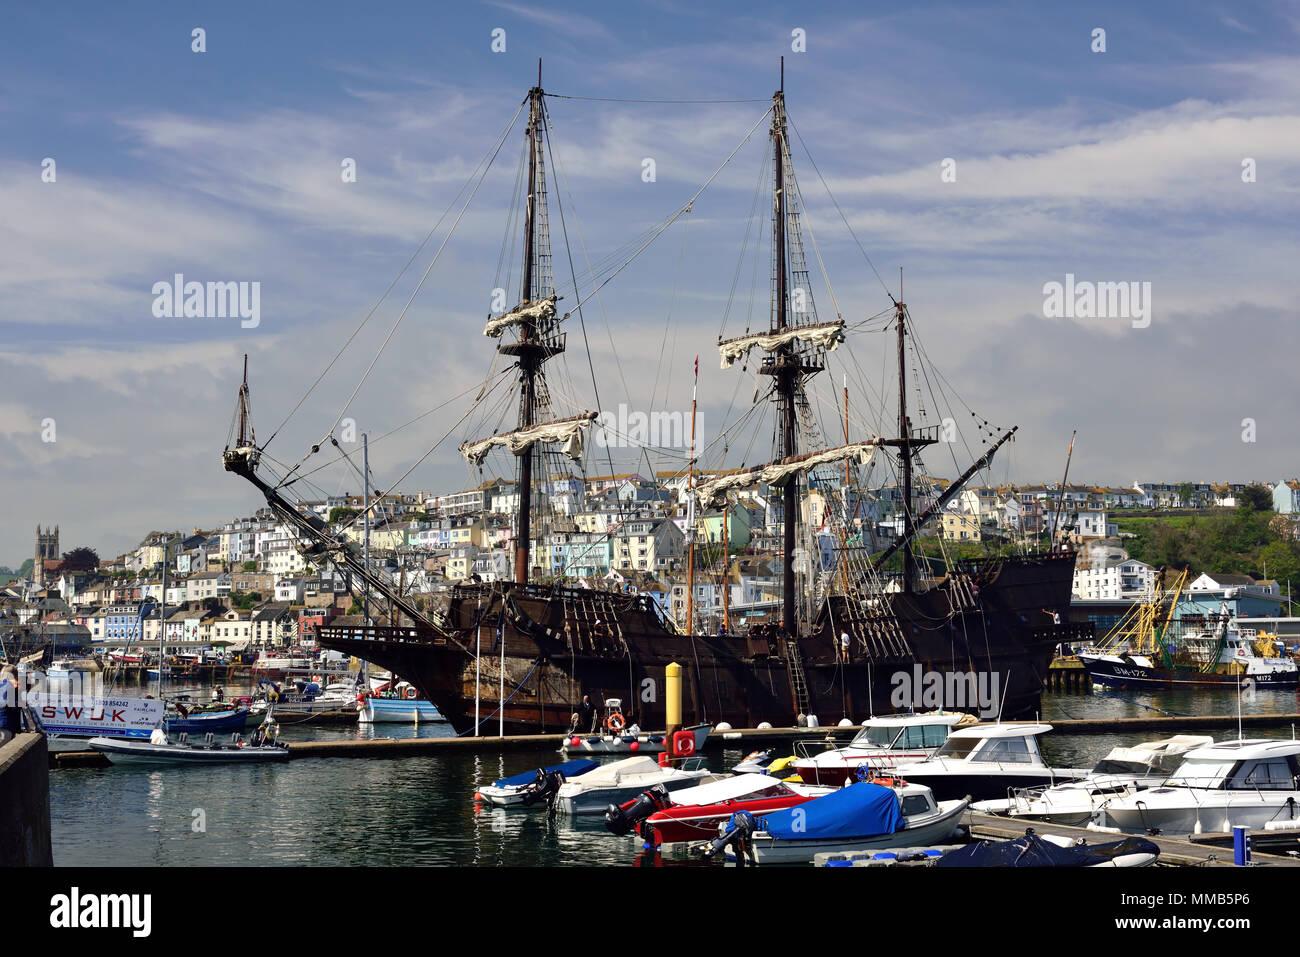 El Galeon Andalucia moored at Brixham in Devon. - Stock Image